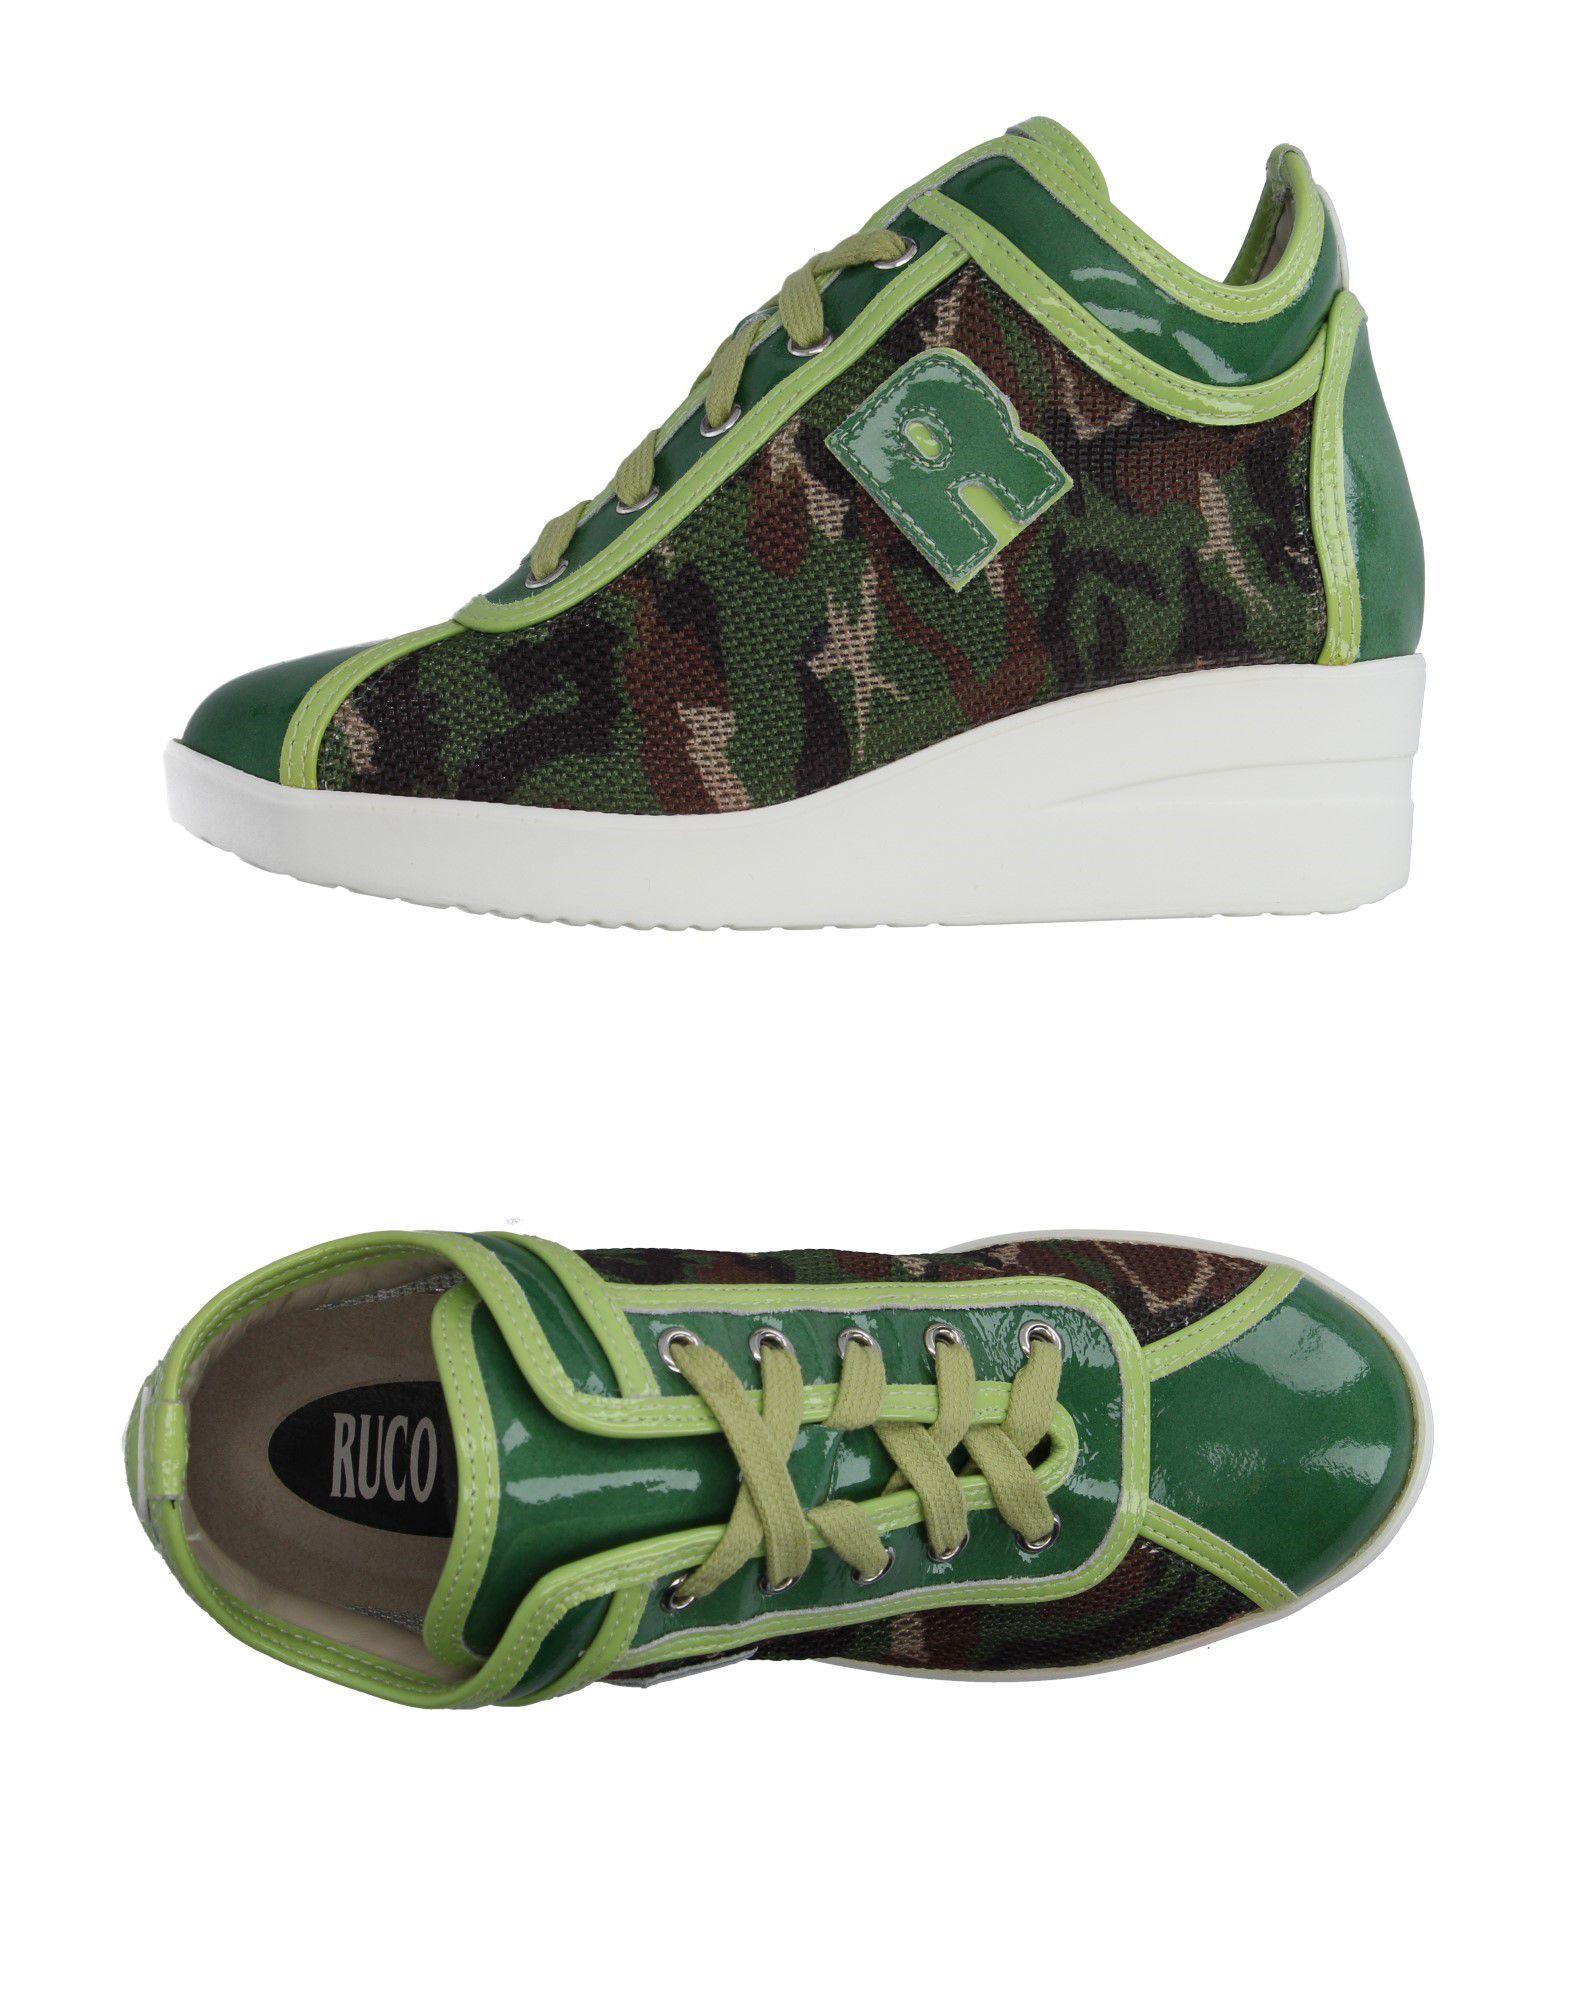 Zapatillas Ruco Line Mujer - - Mujer Zapatillas Ruco Line  Verde militar b88a9d